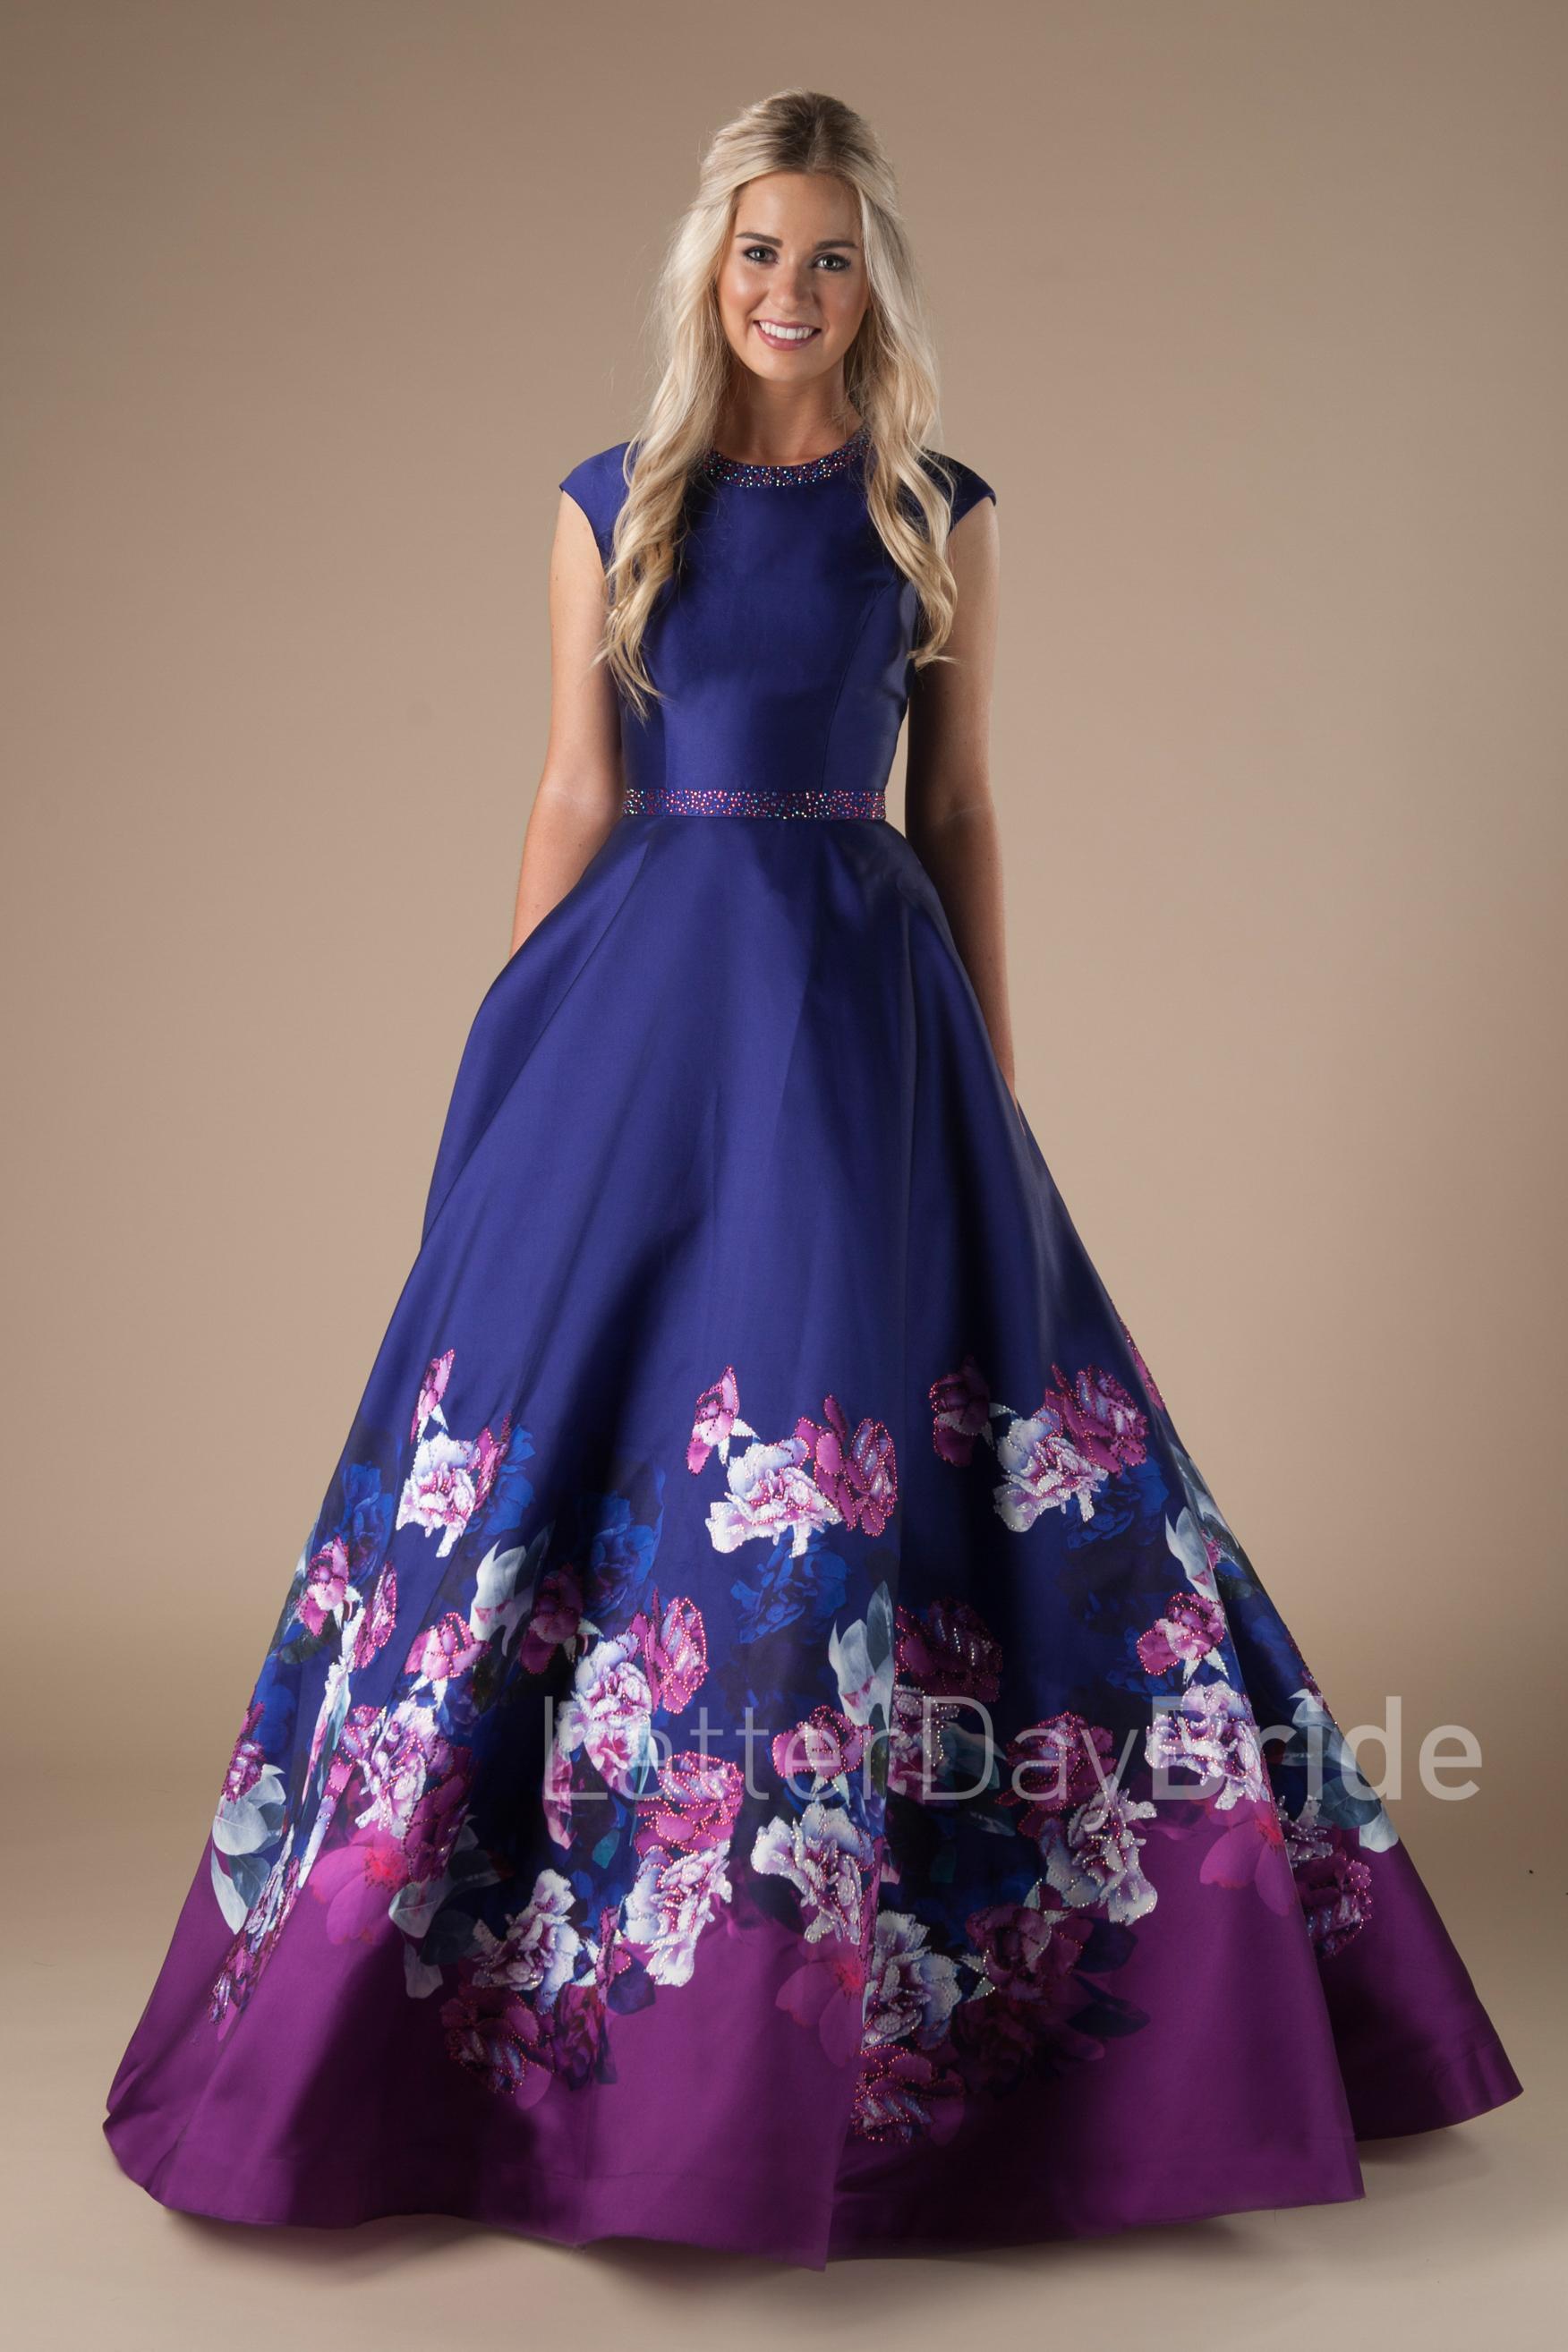 purple wedding dresses for sale photo - 1